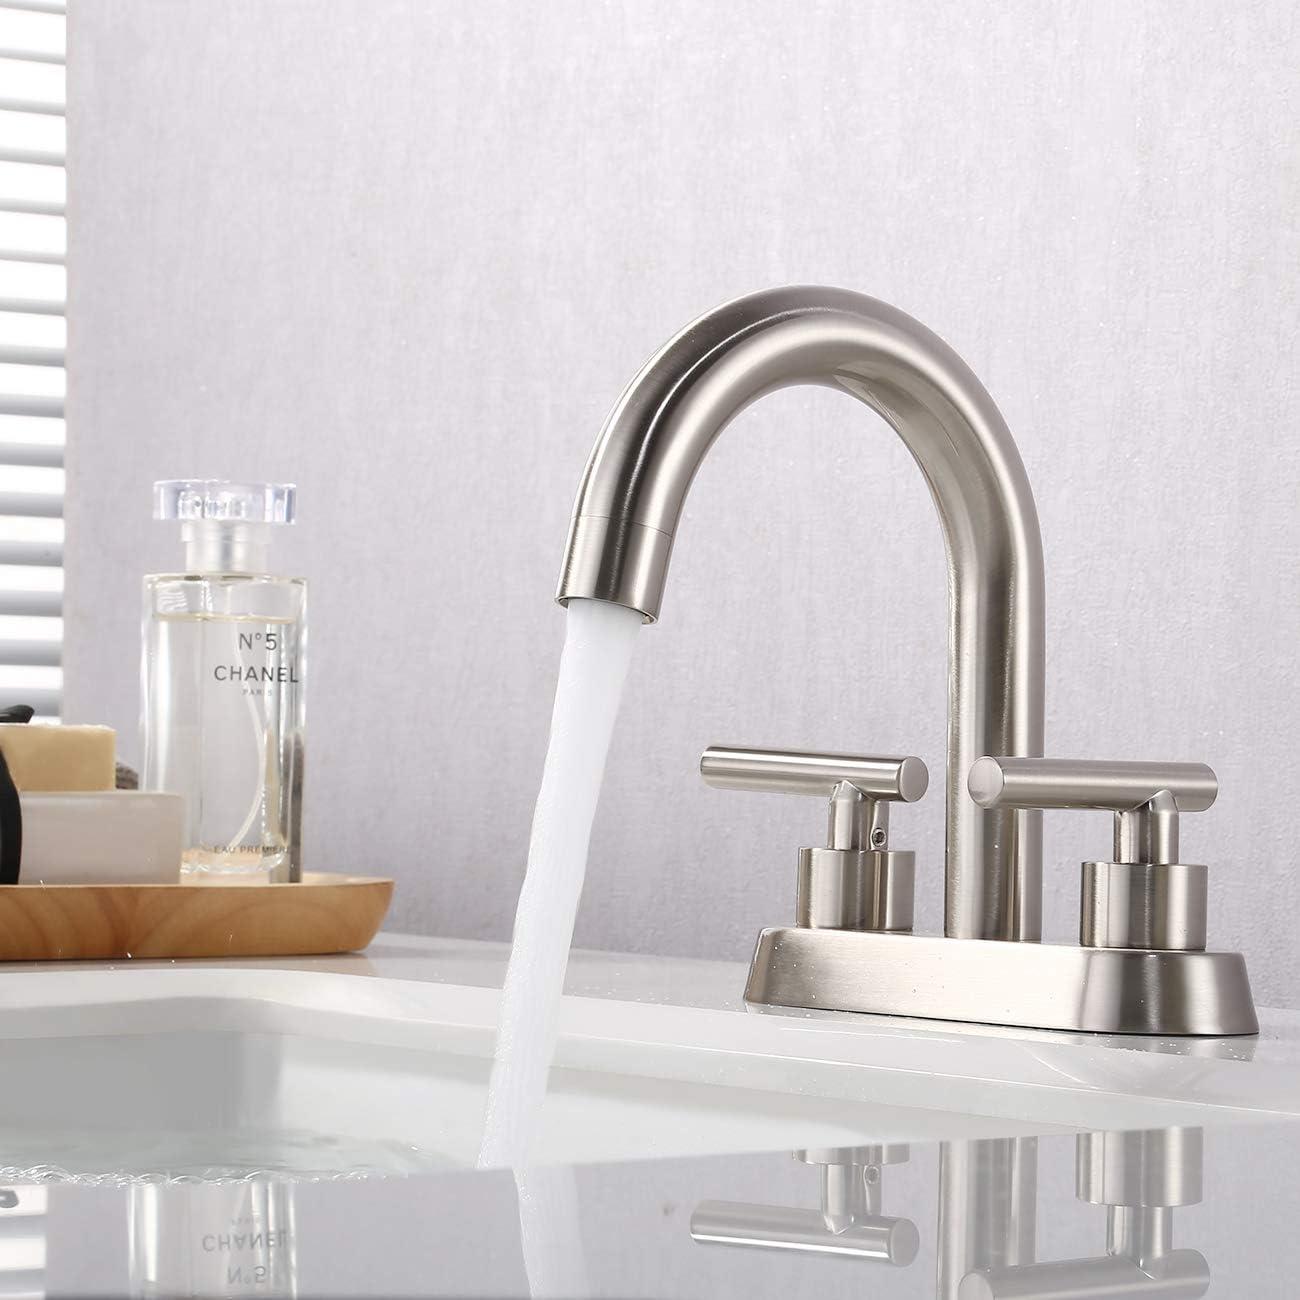 Buy KES 20 Inches Centerset Bathroom Sink Faucet Brushed Nickel ...